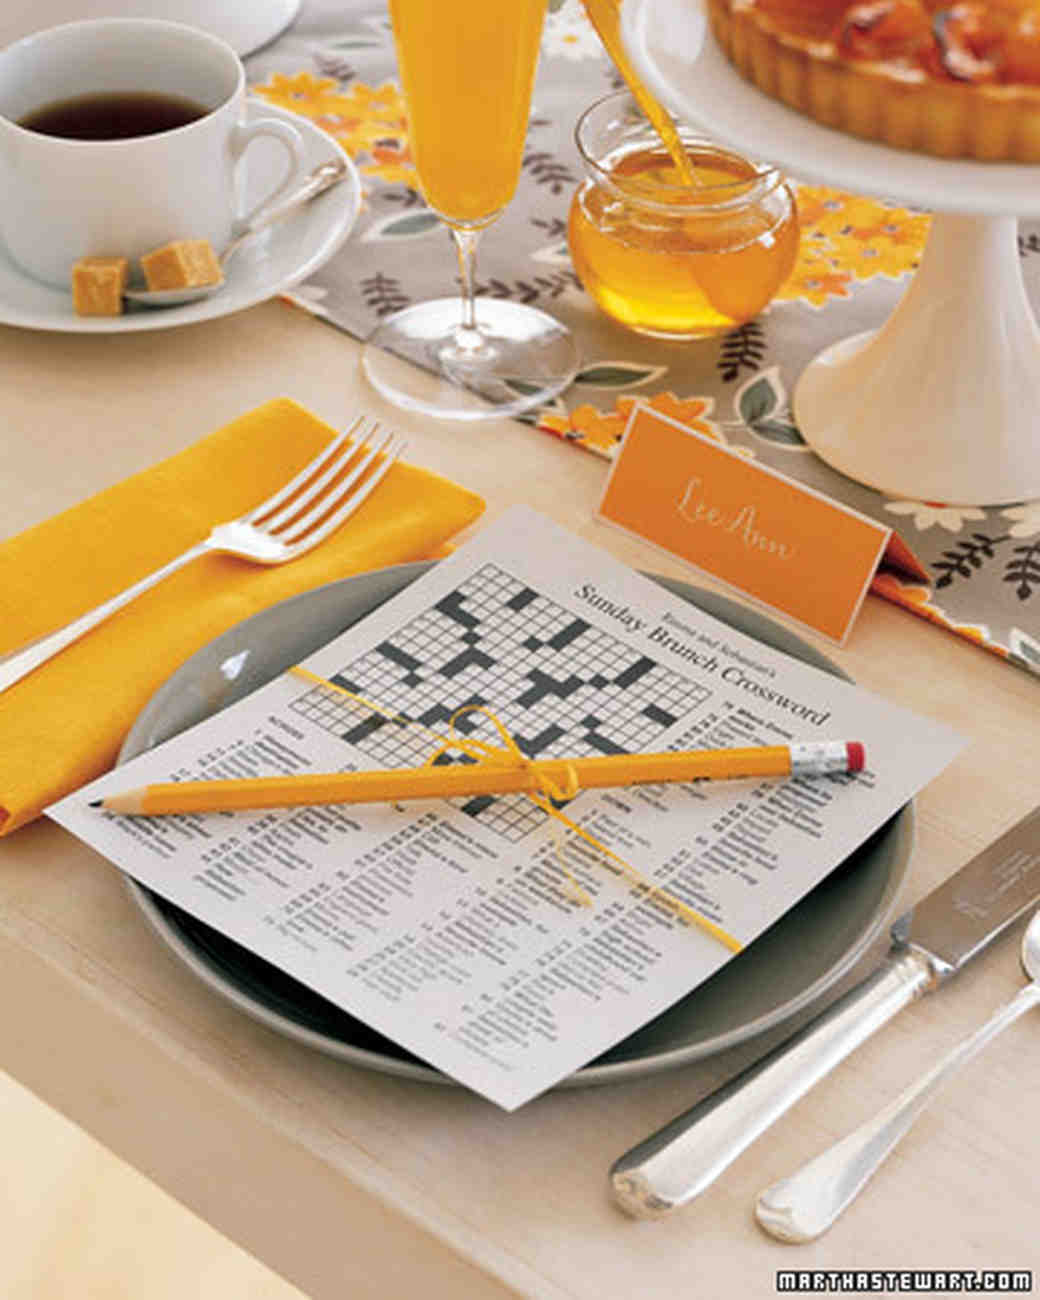 mwa102833_spr07_crossword.jpg